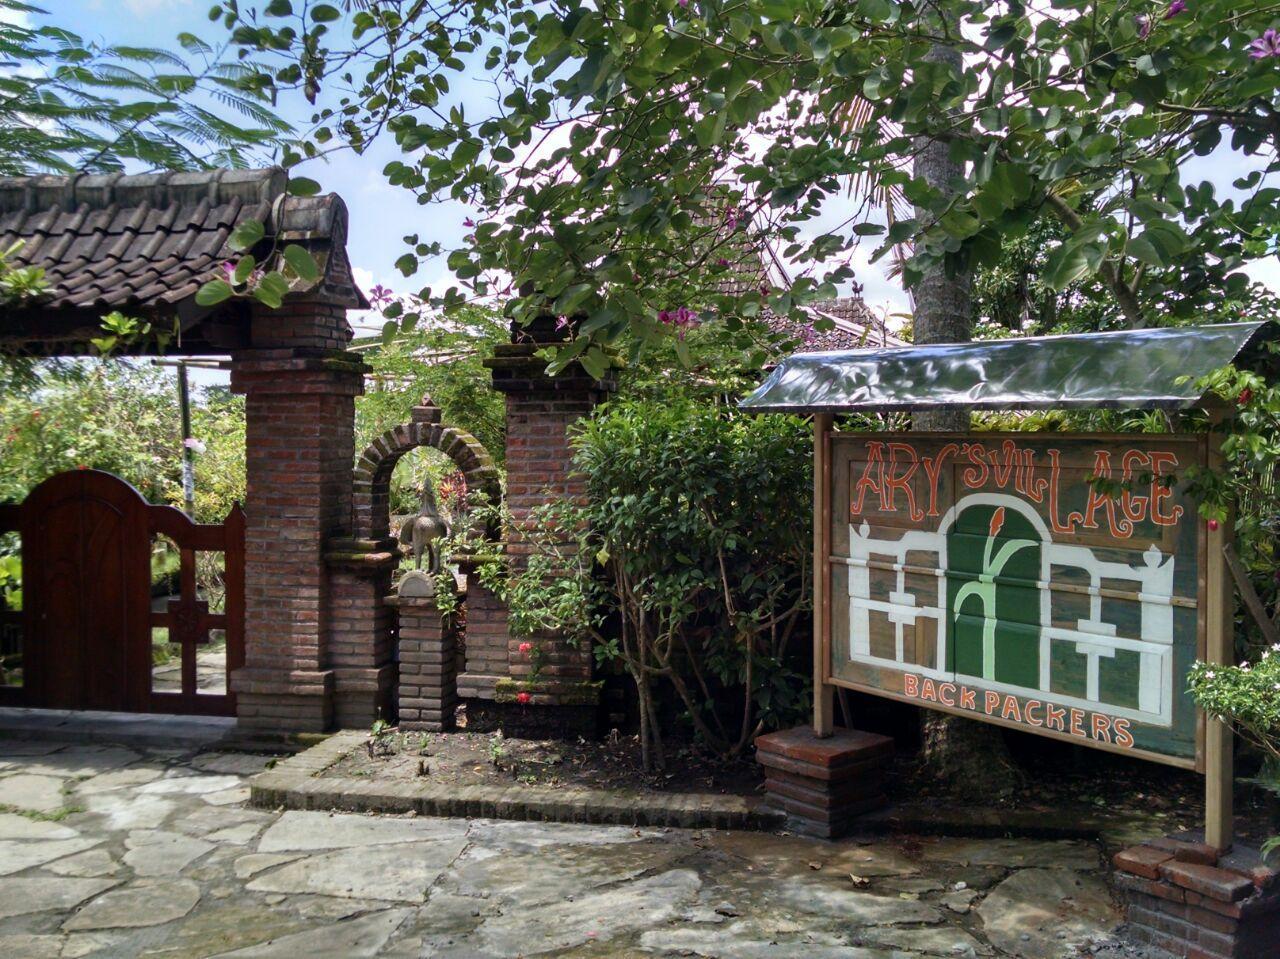 Ary's Village, Bantul